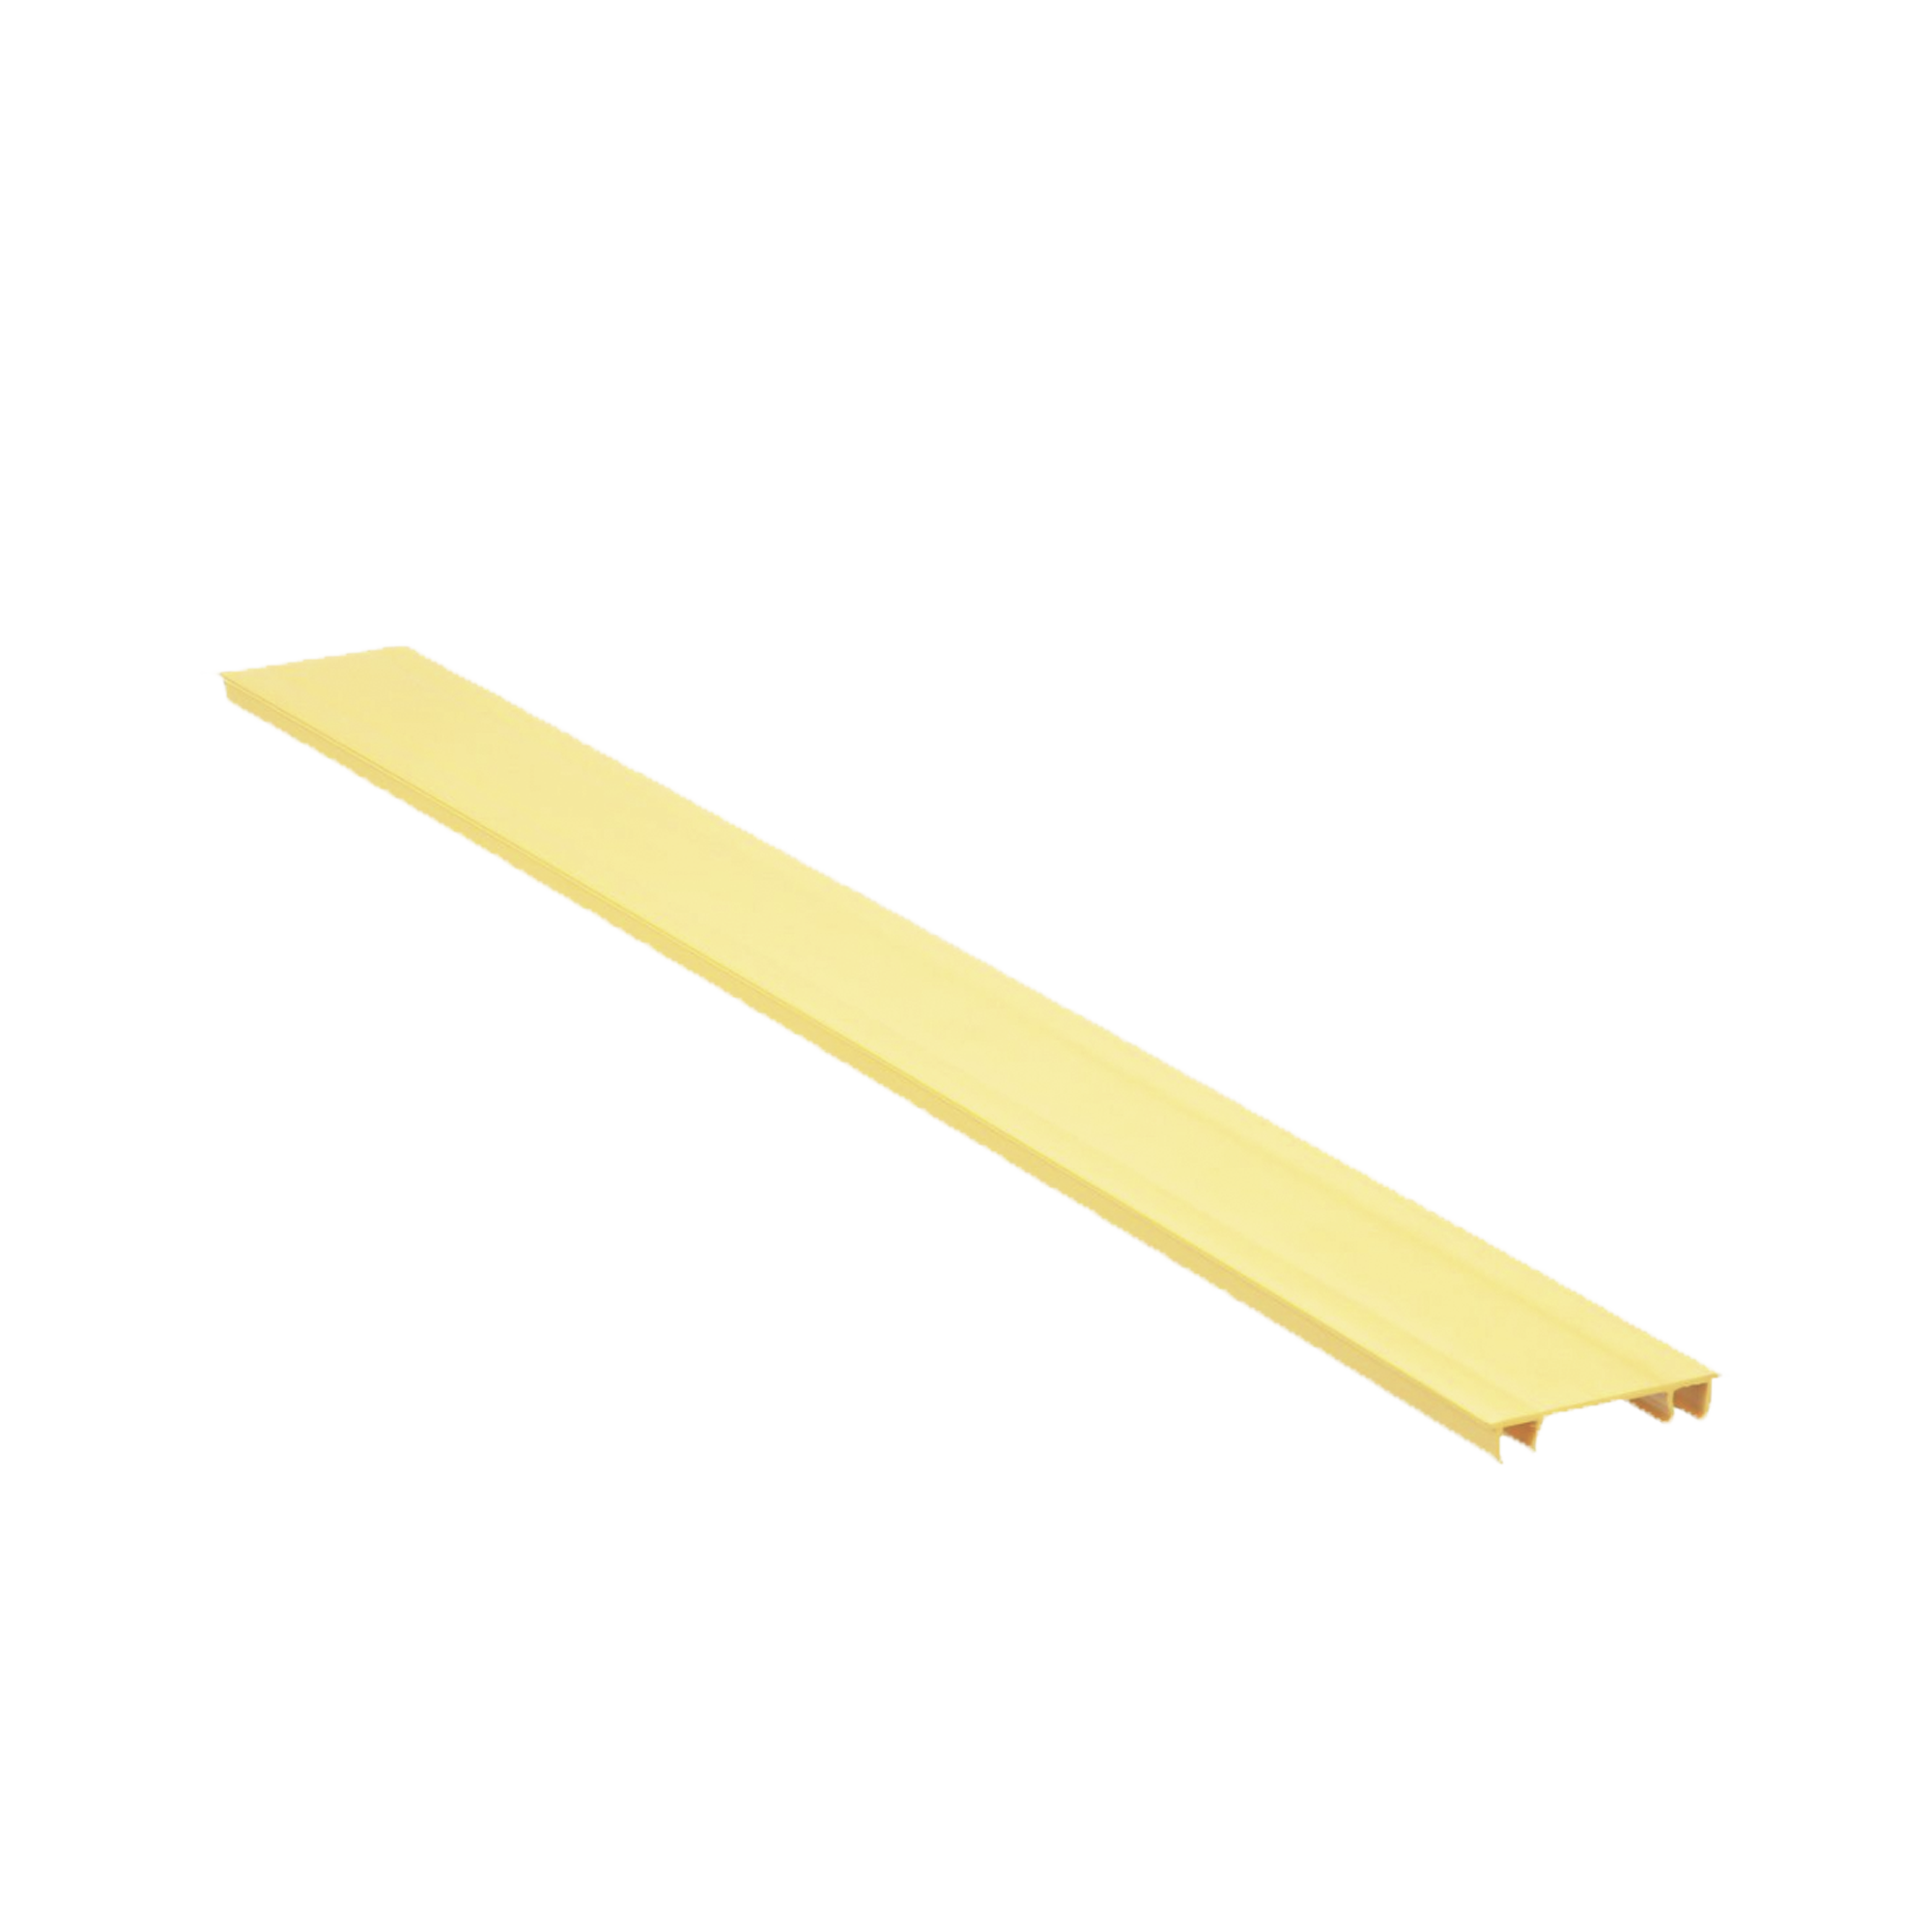 Tapa para Canaleta Ranurada Tipo H, de 2 in de Ancho, 1828.8 mm de Largo, Color Amarilo